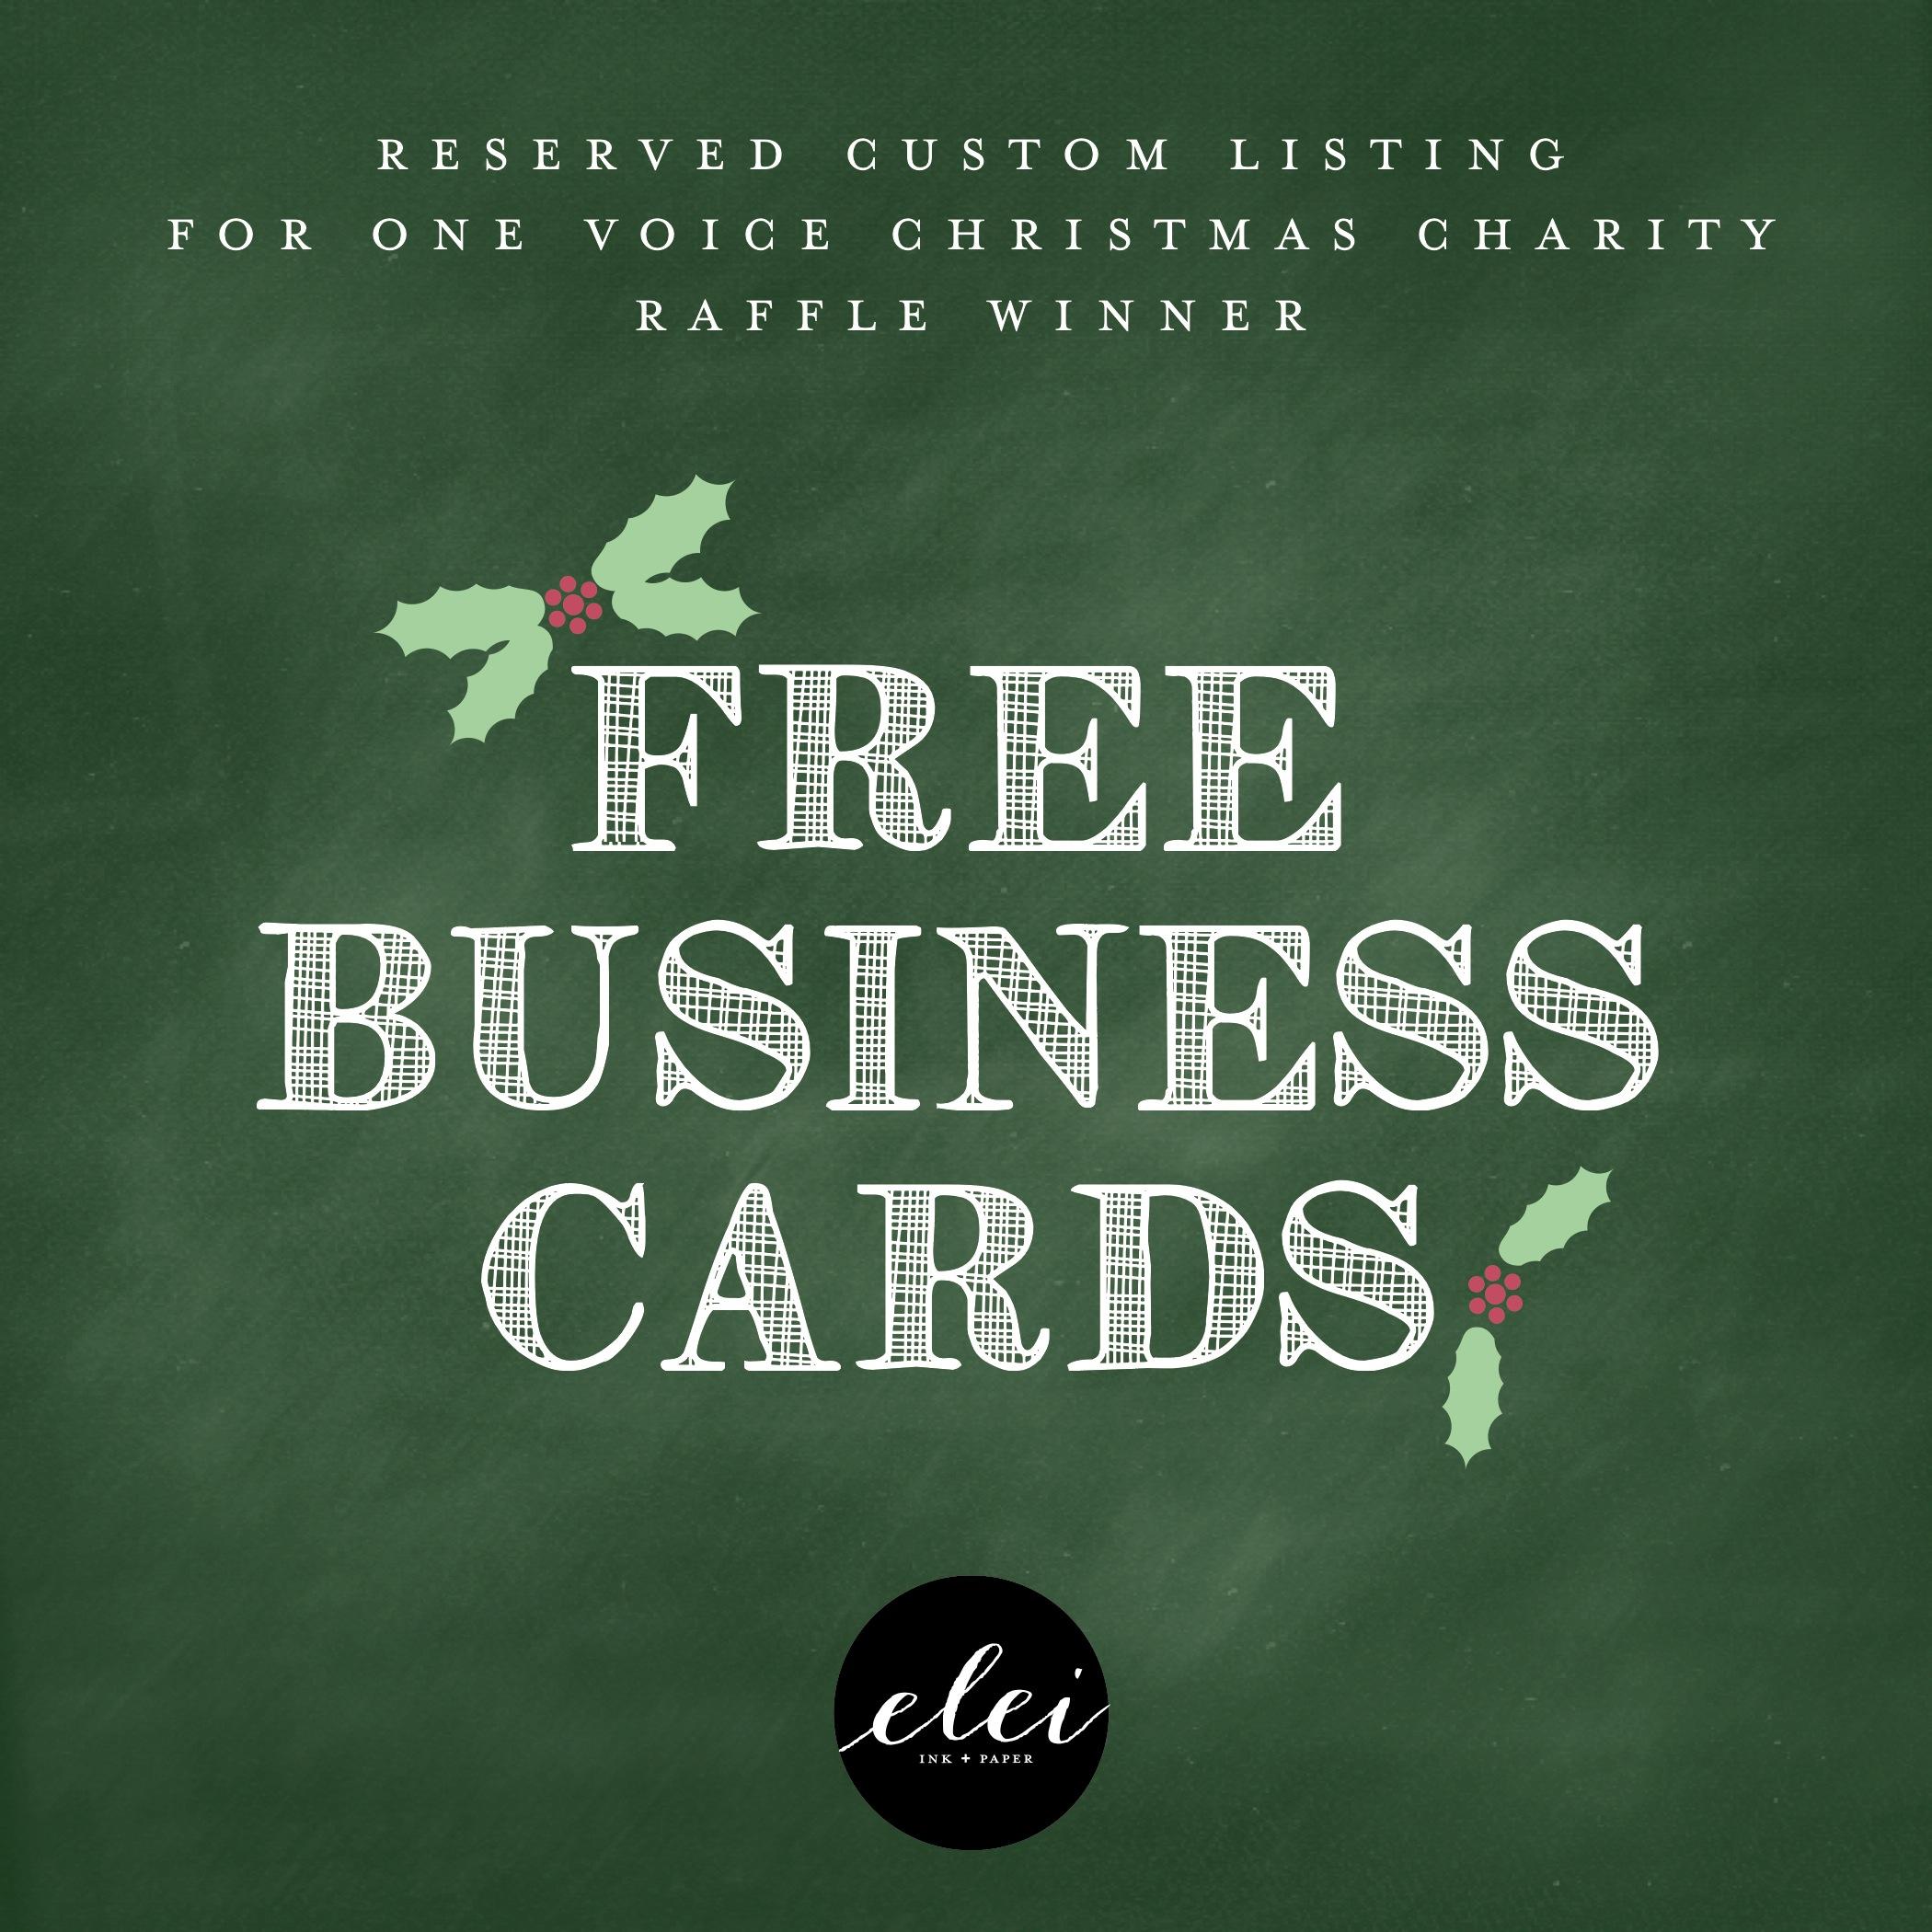 Custom Business Cards - Charity Raffle Winner · Elei Ink and